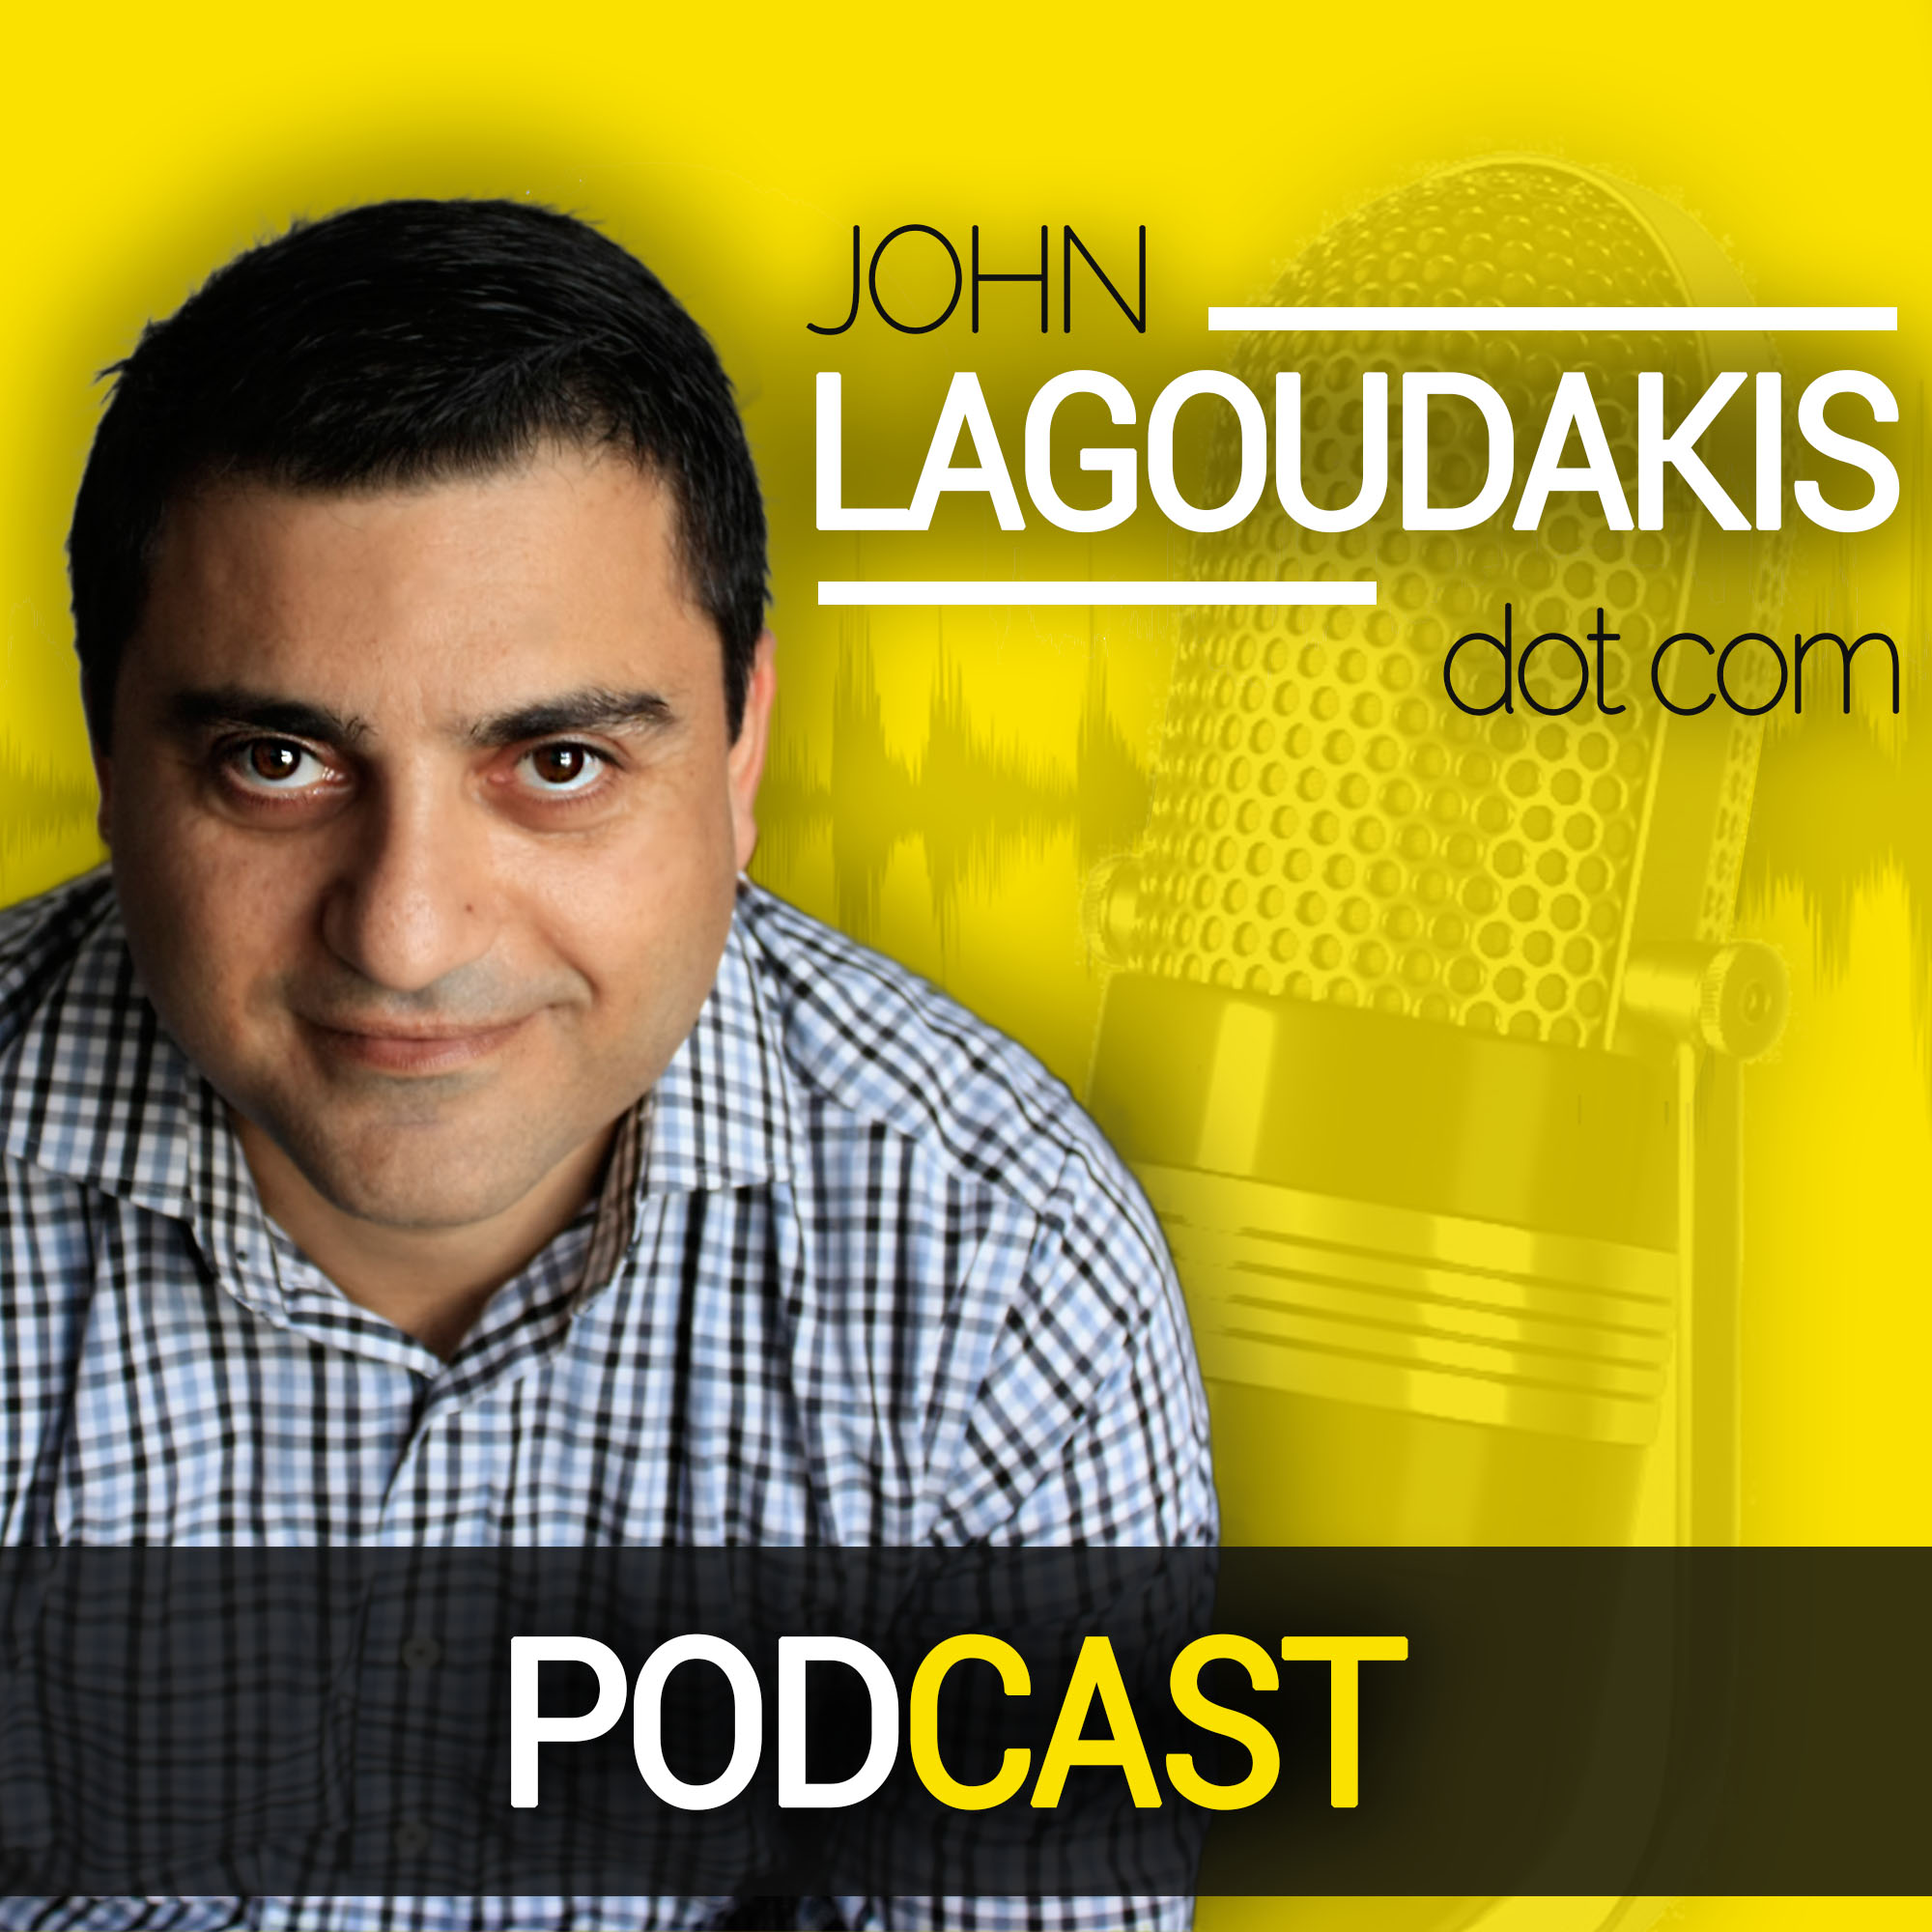 John Lagoudakis dot Com Podcast: Internet Marketing | Personal Development | Business